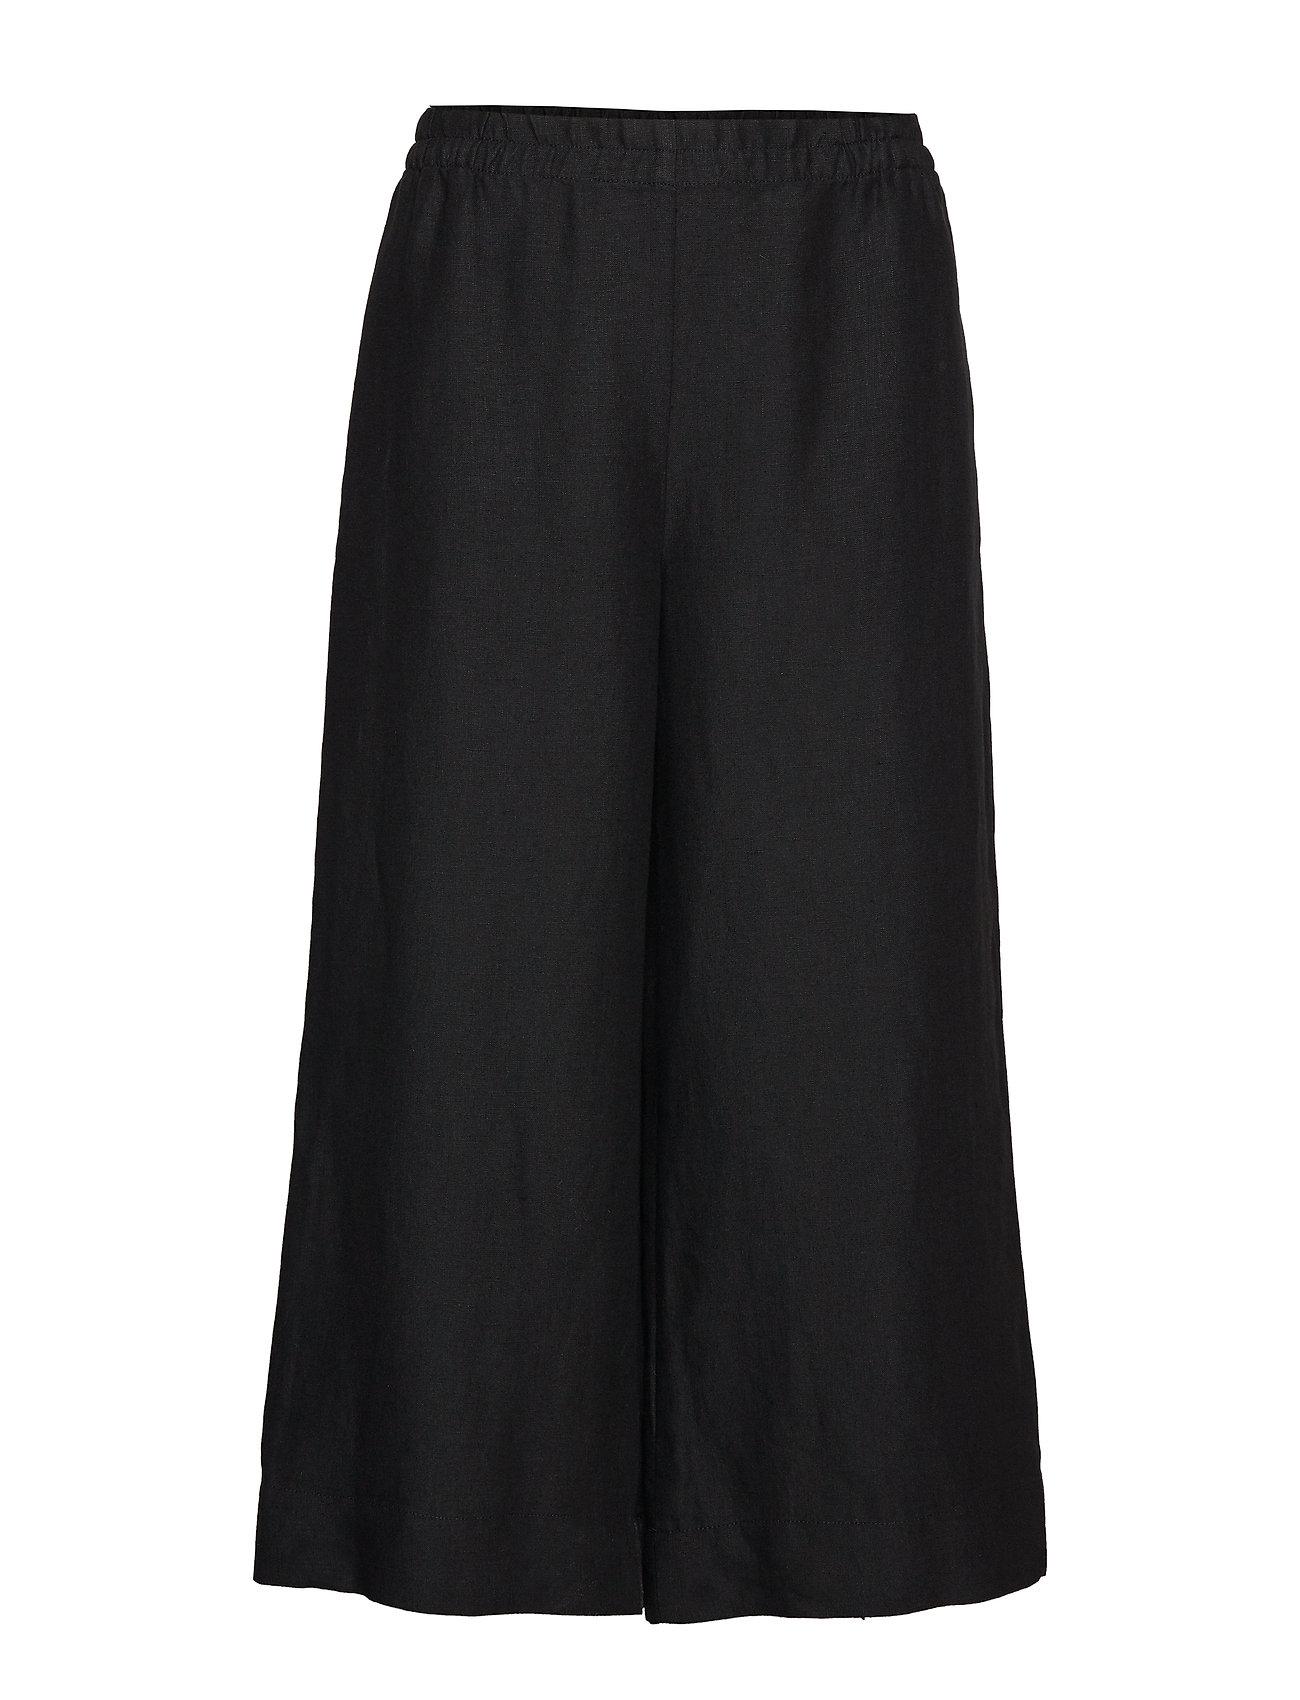 Image of Tuulelma Solid Trousers Vide Bukser Sort Marimekko (3191979067)